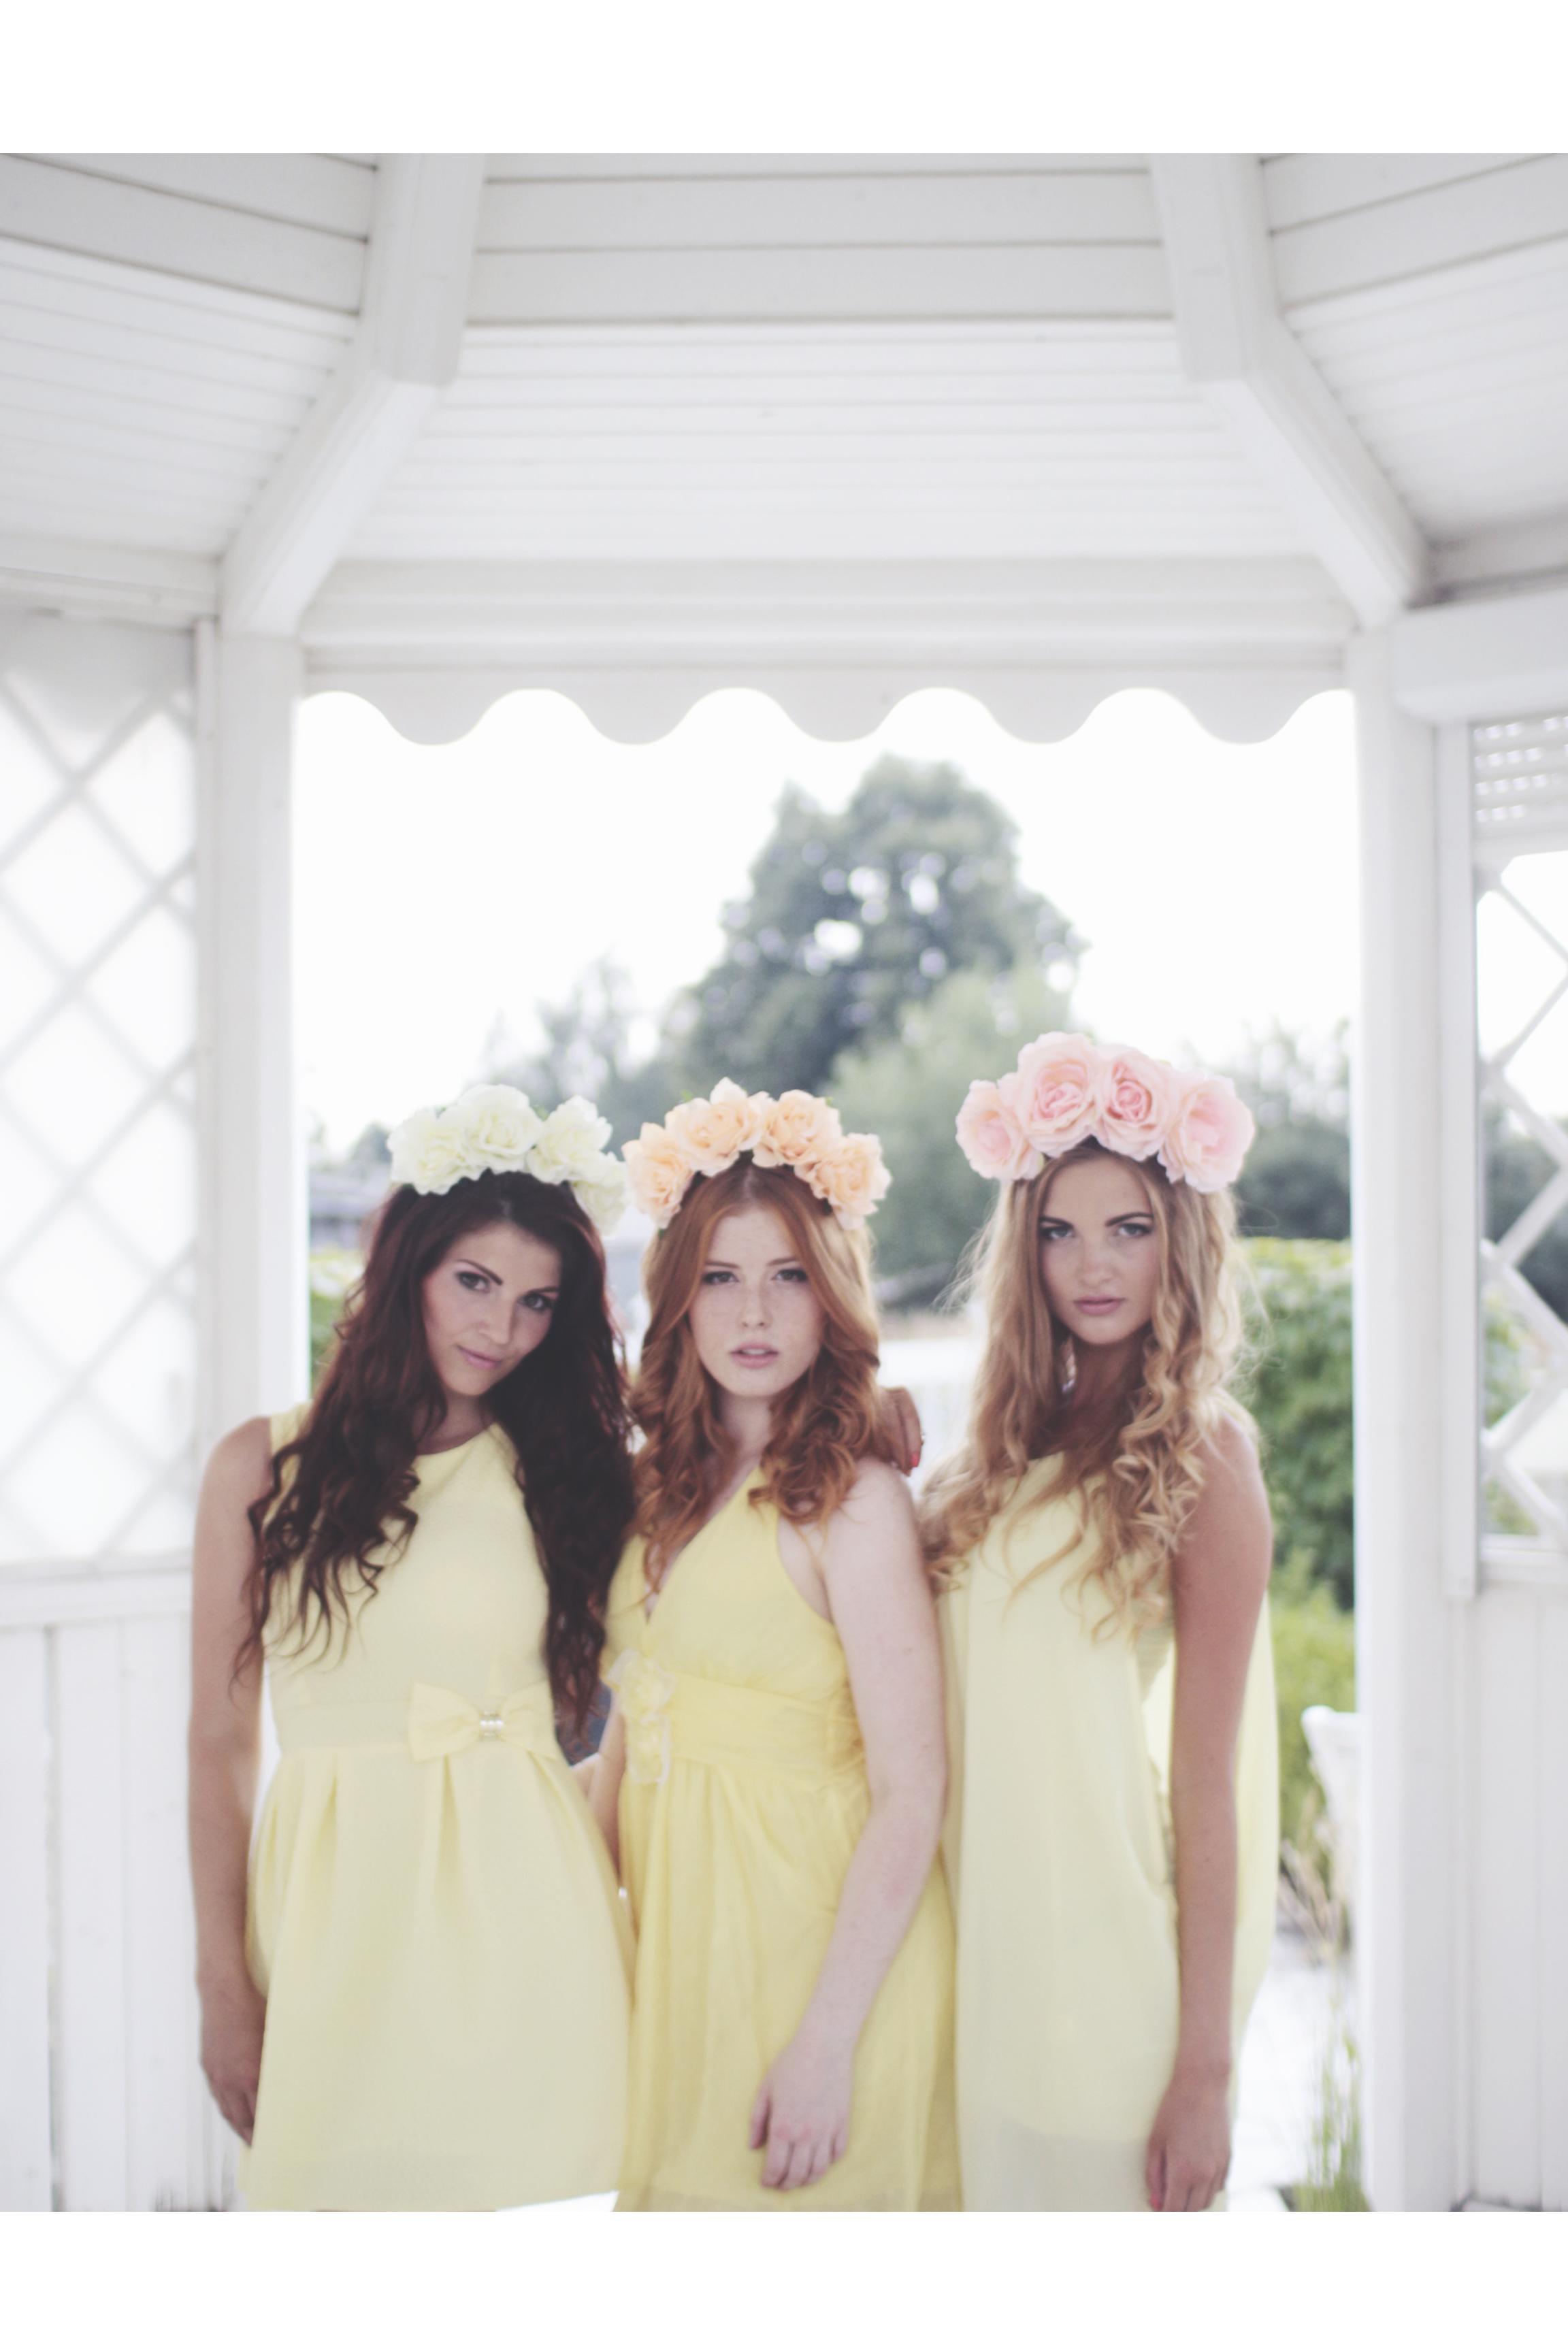 Lenka Regalová redhead freackles flowercrown pure brunette blond